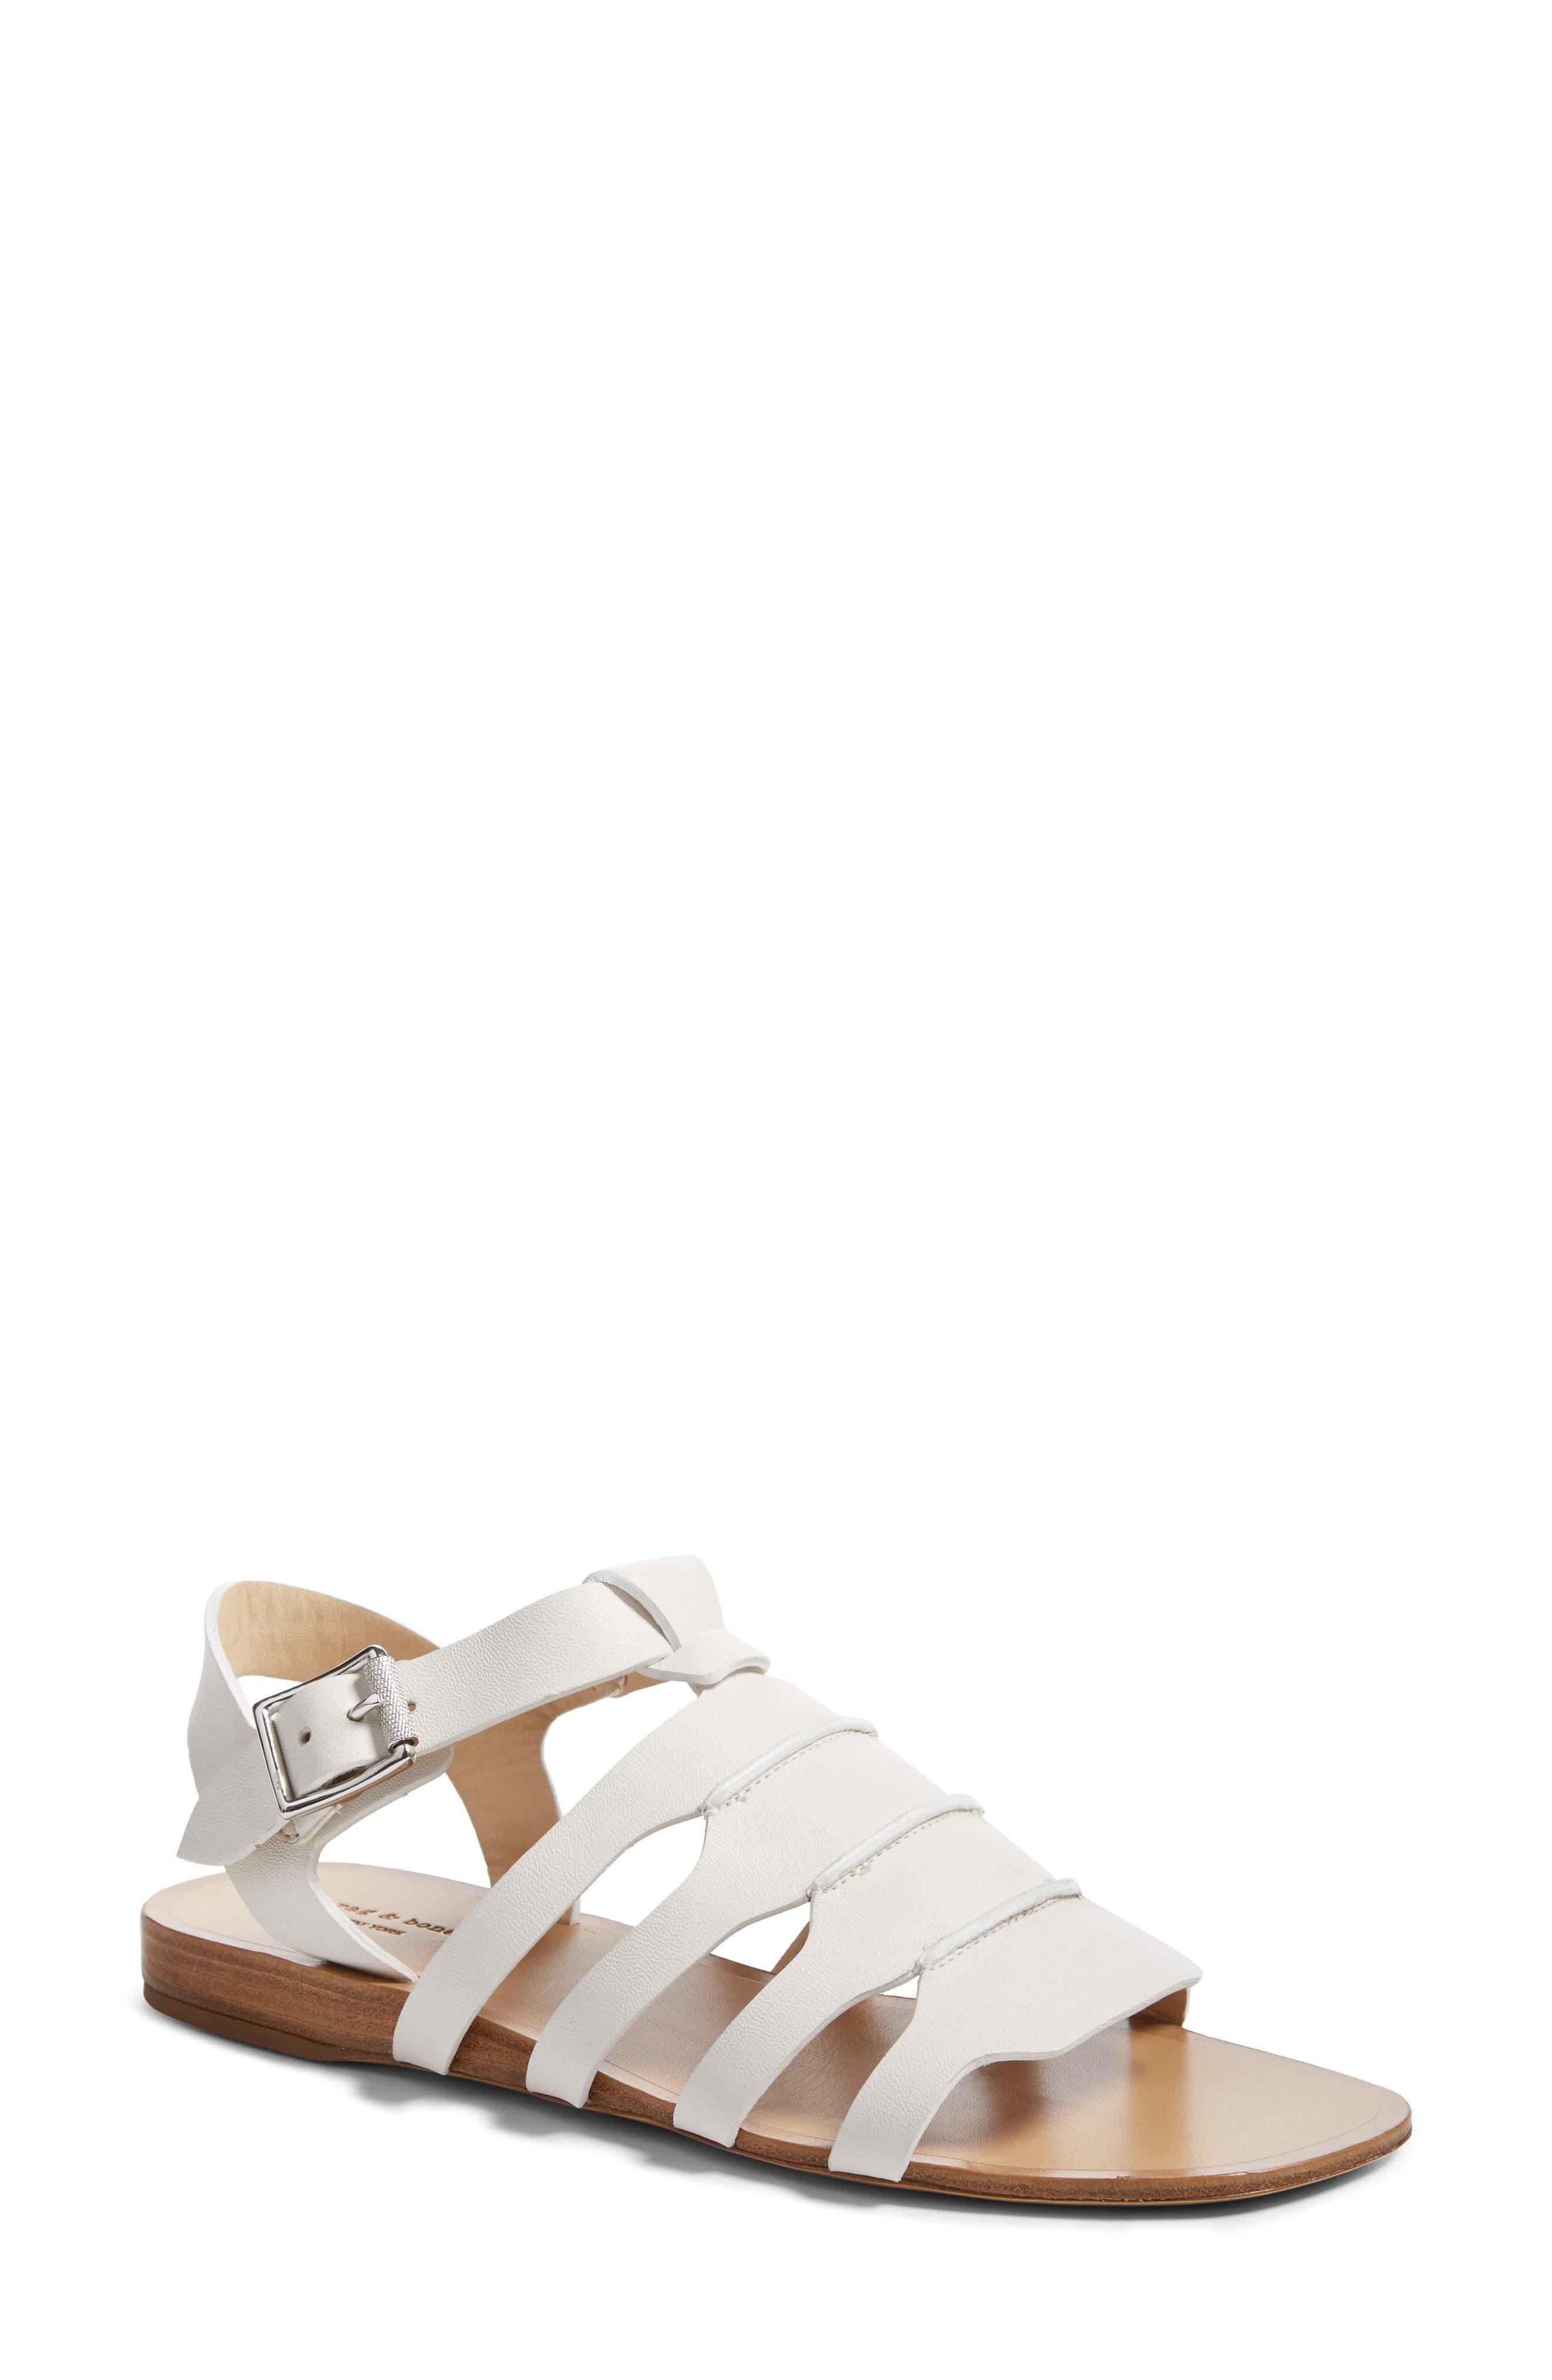 RAG & BONE Karli Low Gladiator Sandal